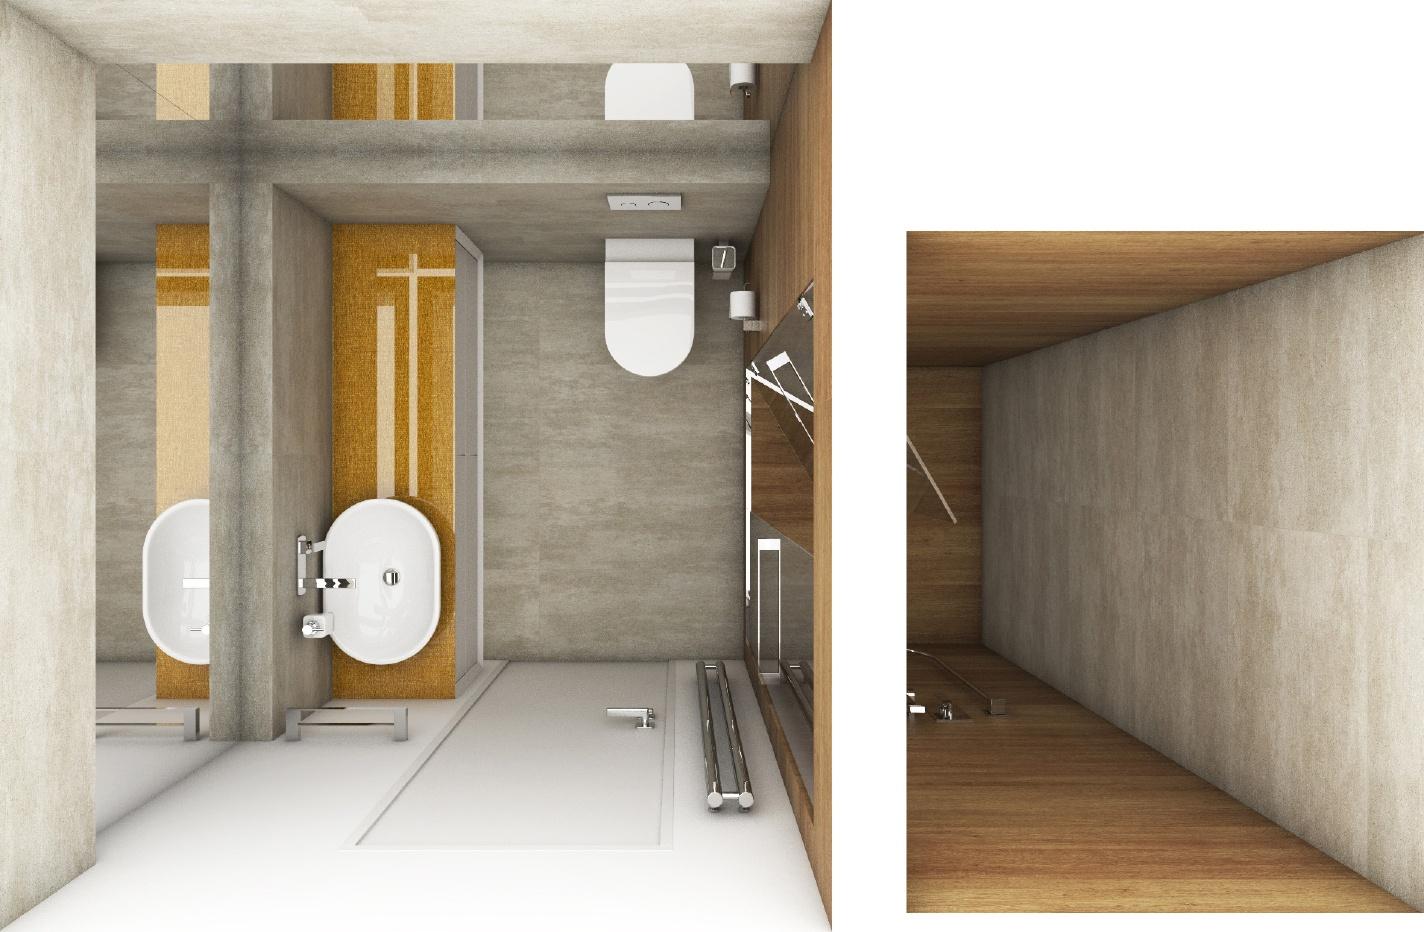 Modernes badezimmer cross gold perfecto design - Moderne badezimmer grundrisse ...